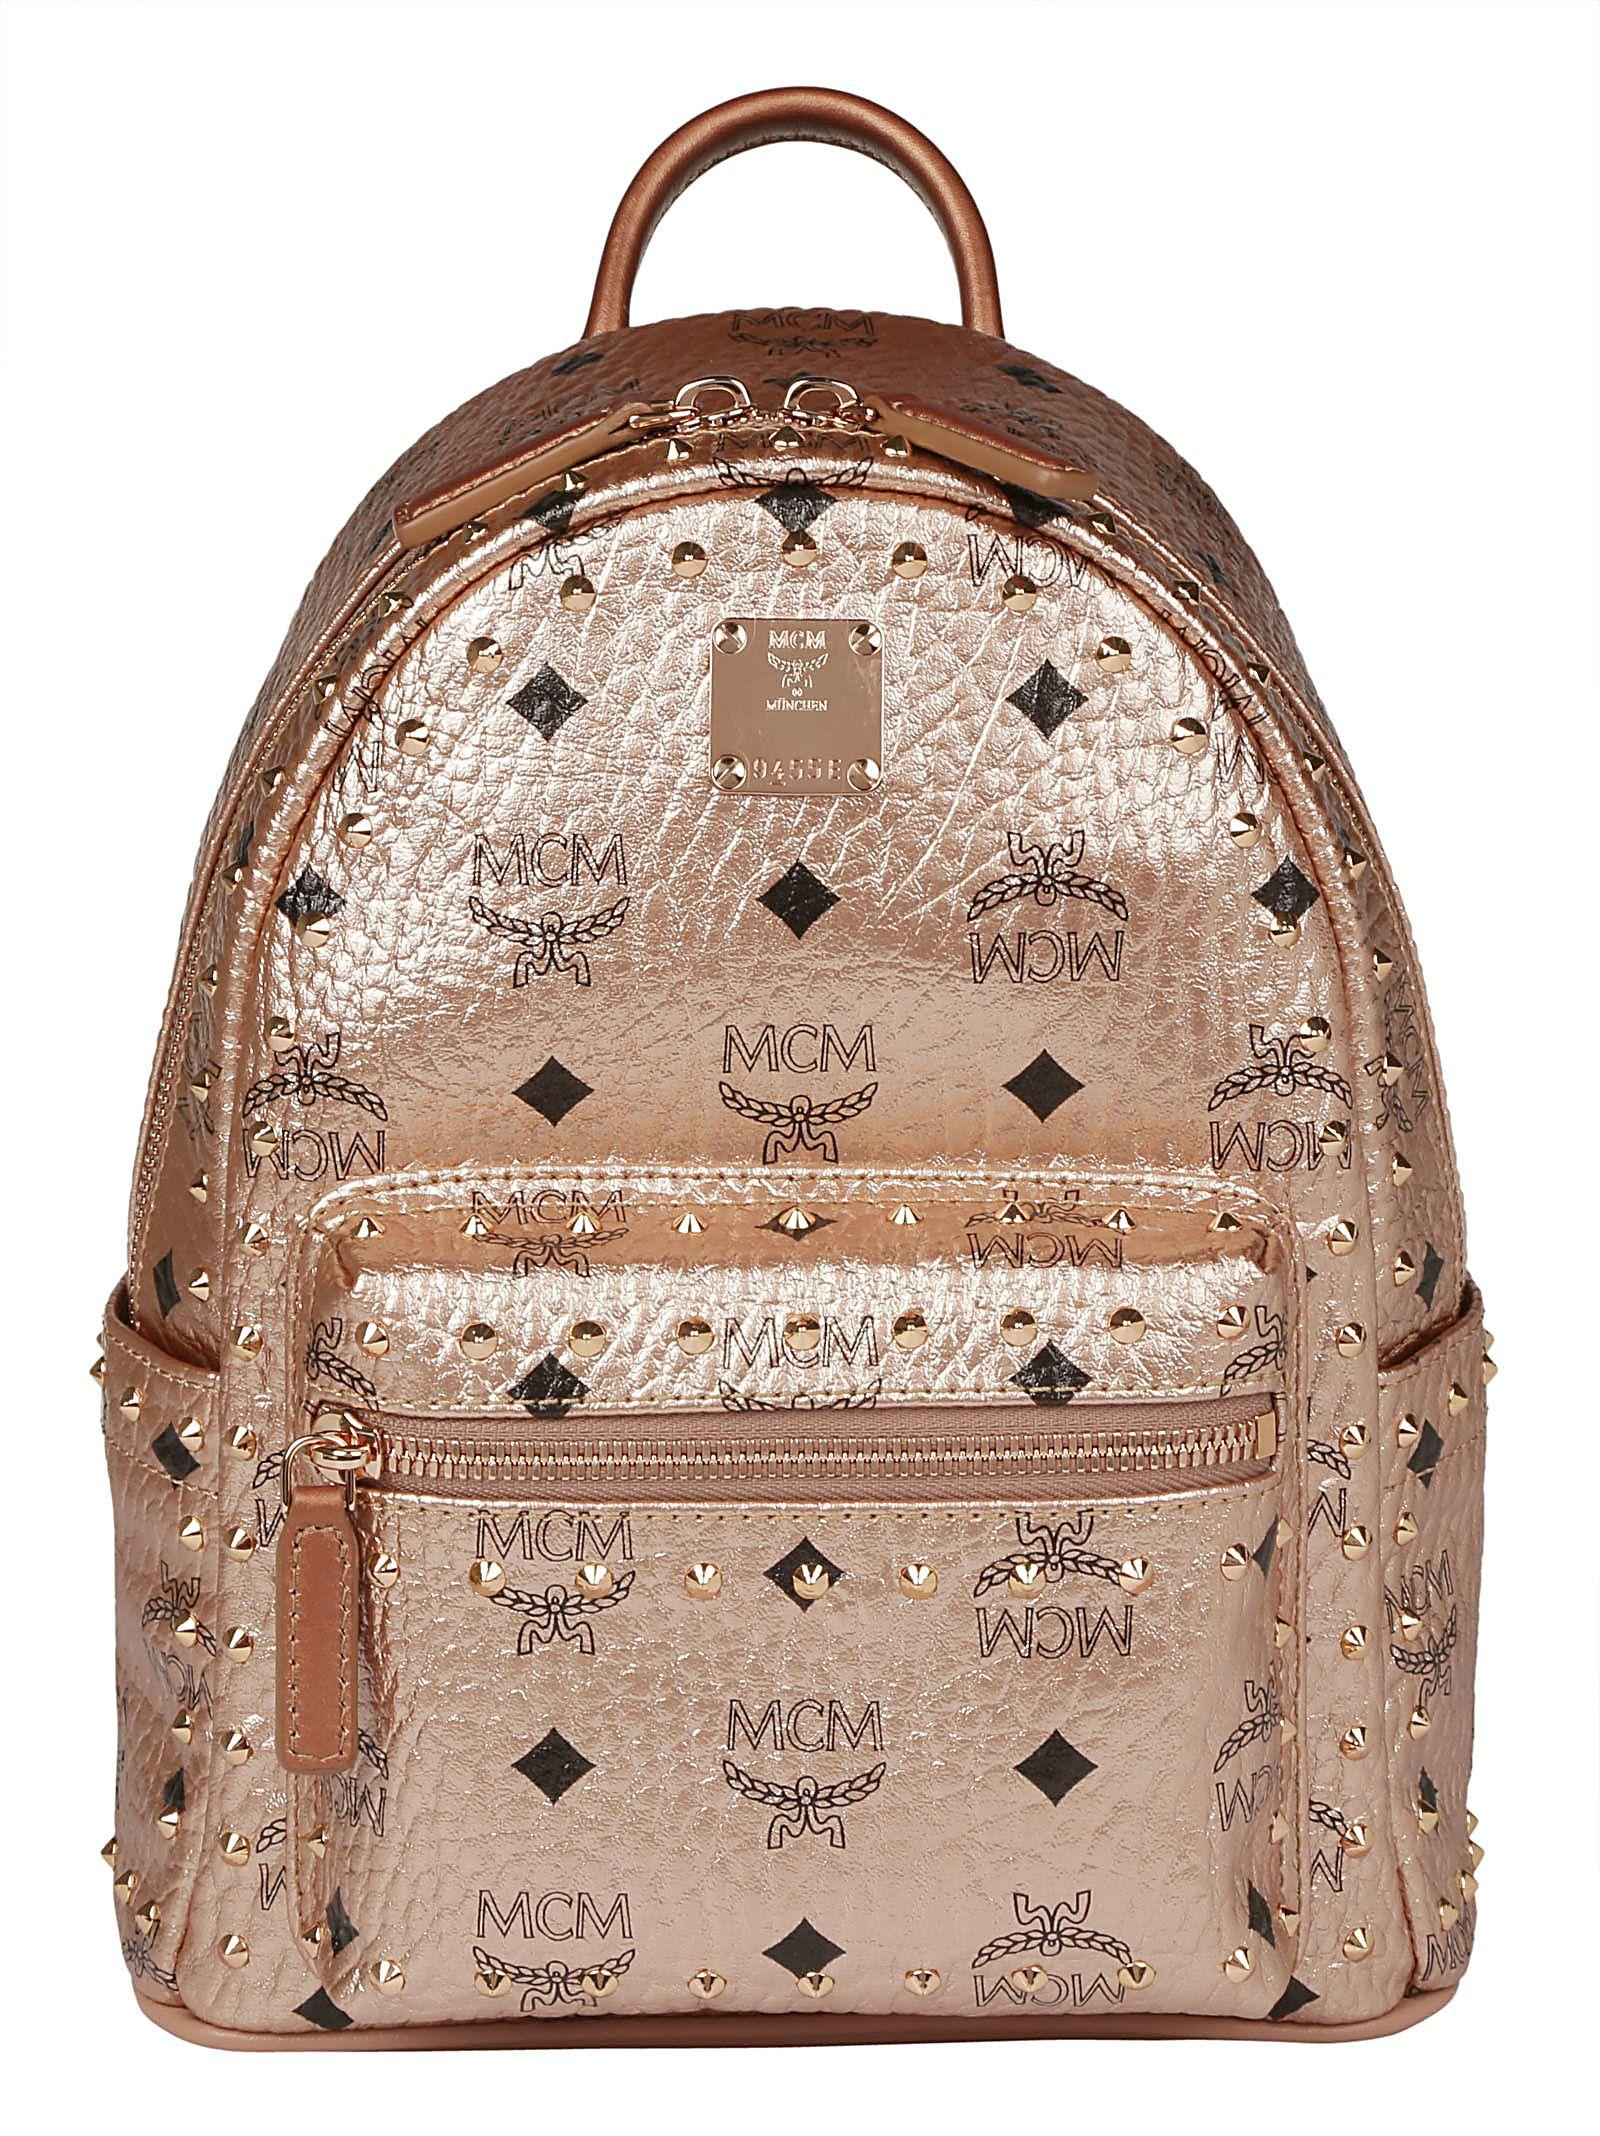 Mcm Mini Stud Stark Backpack In Champagne Gold